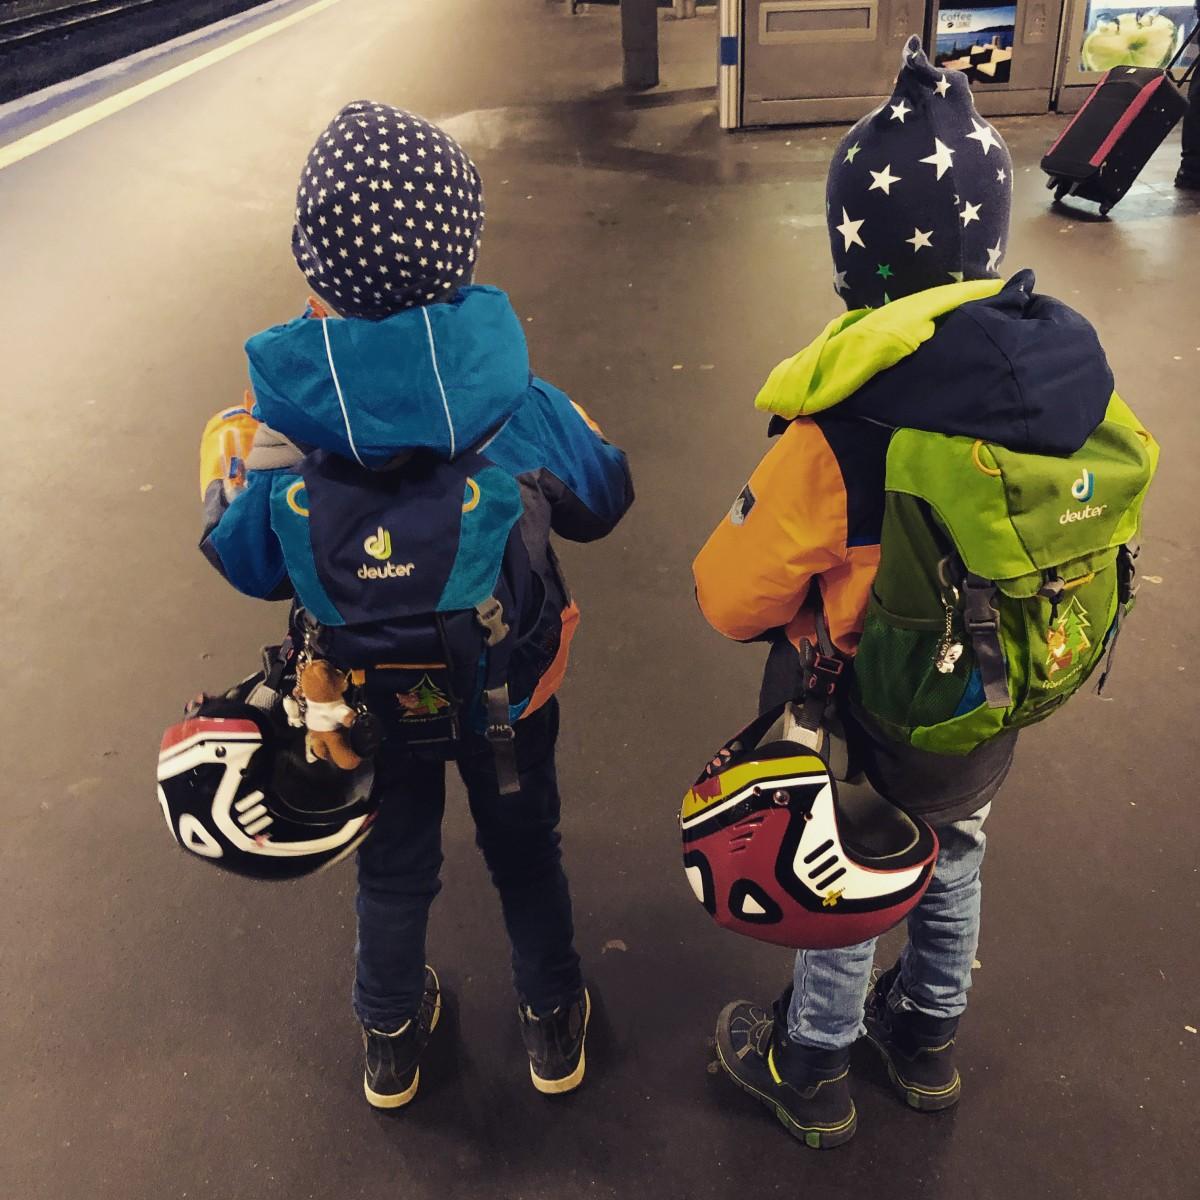 Kindersiek 5 – Geschmäcker sind kindlich verschieden